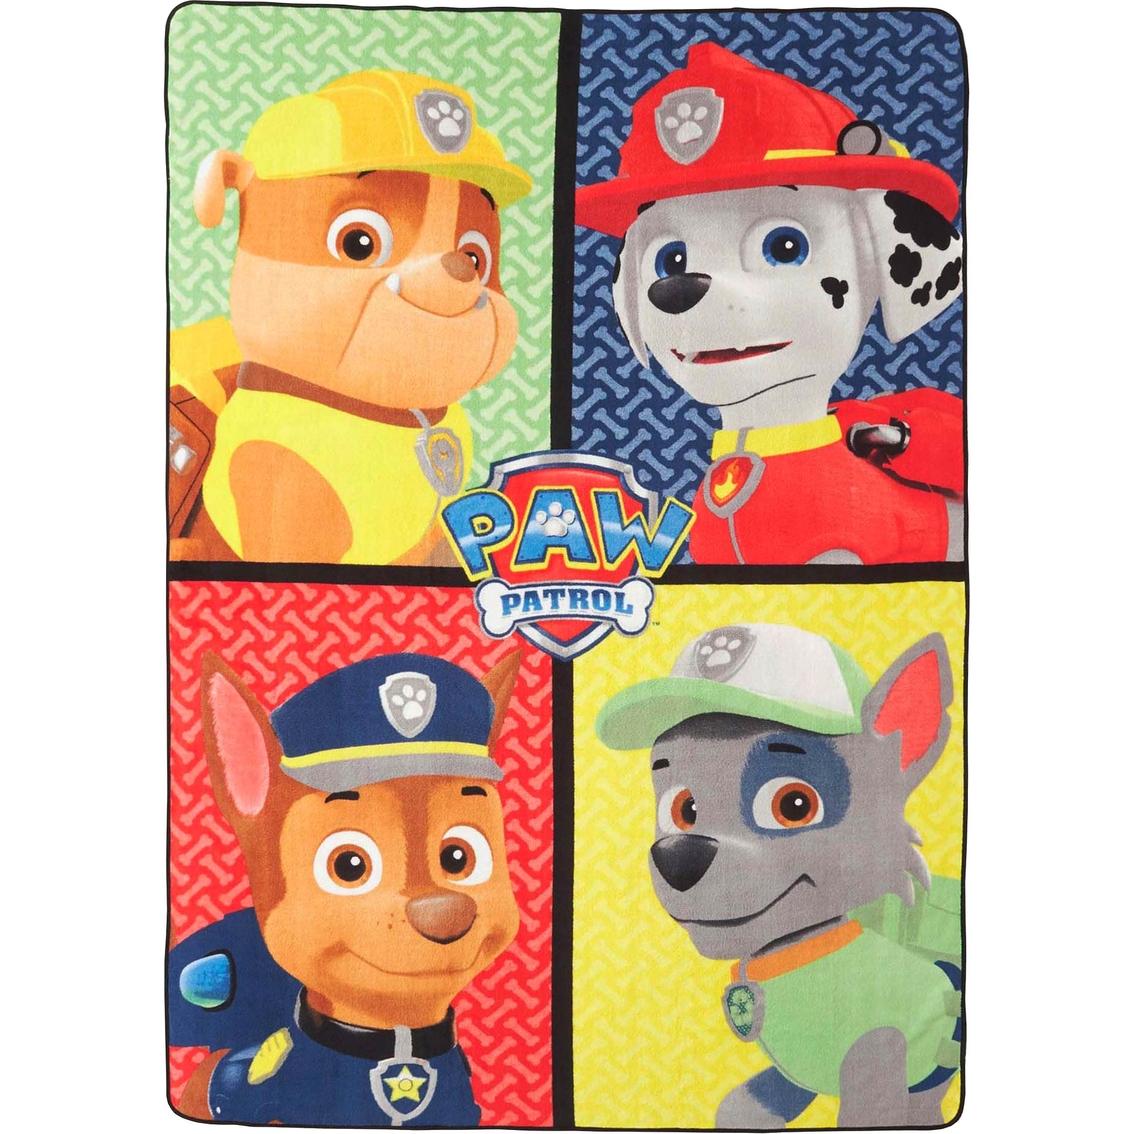 Nick Jr. Paw Patrol Puppy Hero Blanket   Blankets & Throws   Home ...